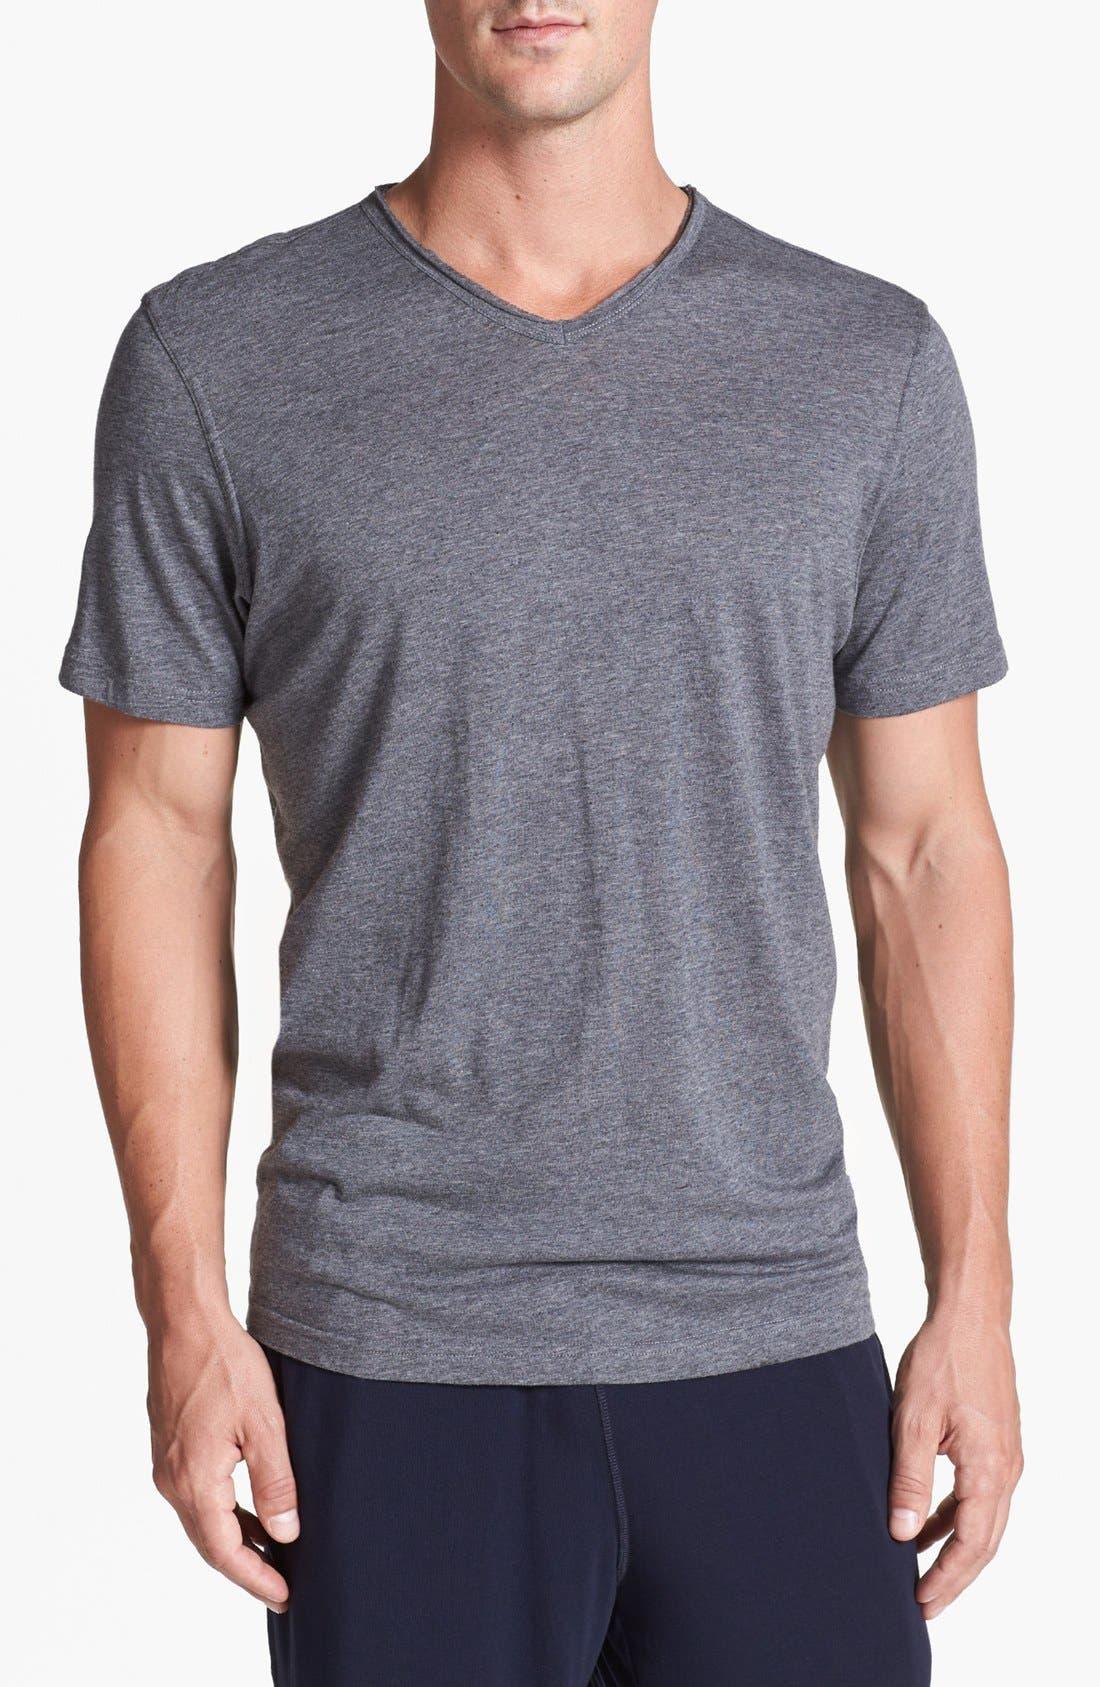 Main Image - Daniel Buchler Cotton Blend V-Neck T-Shirt